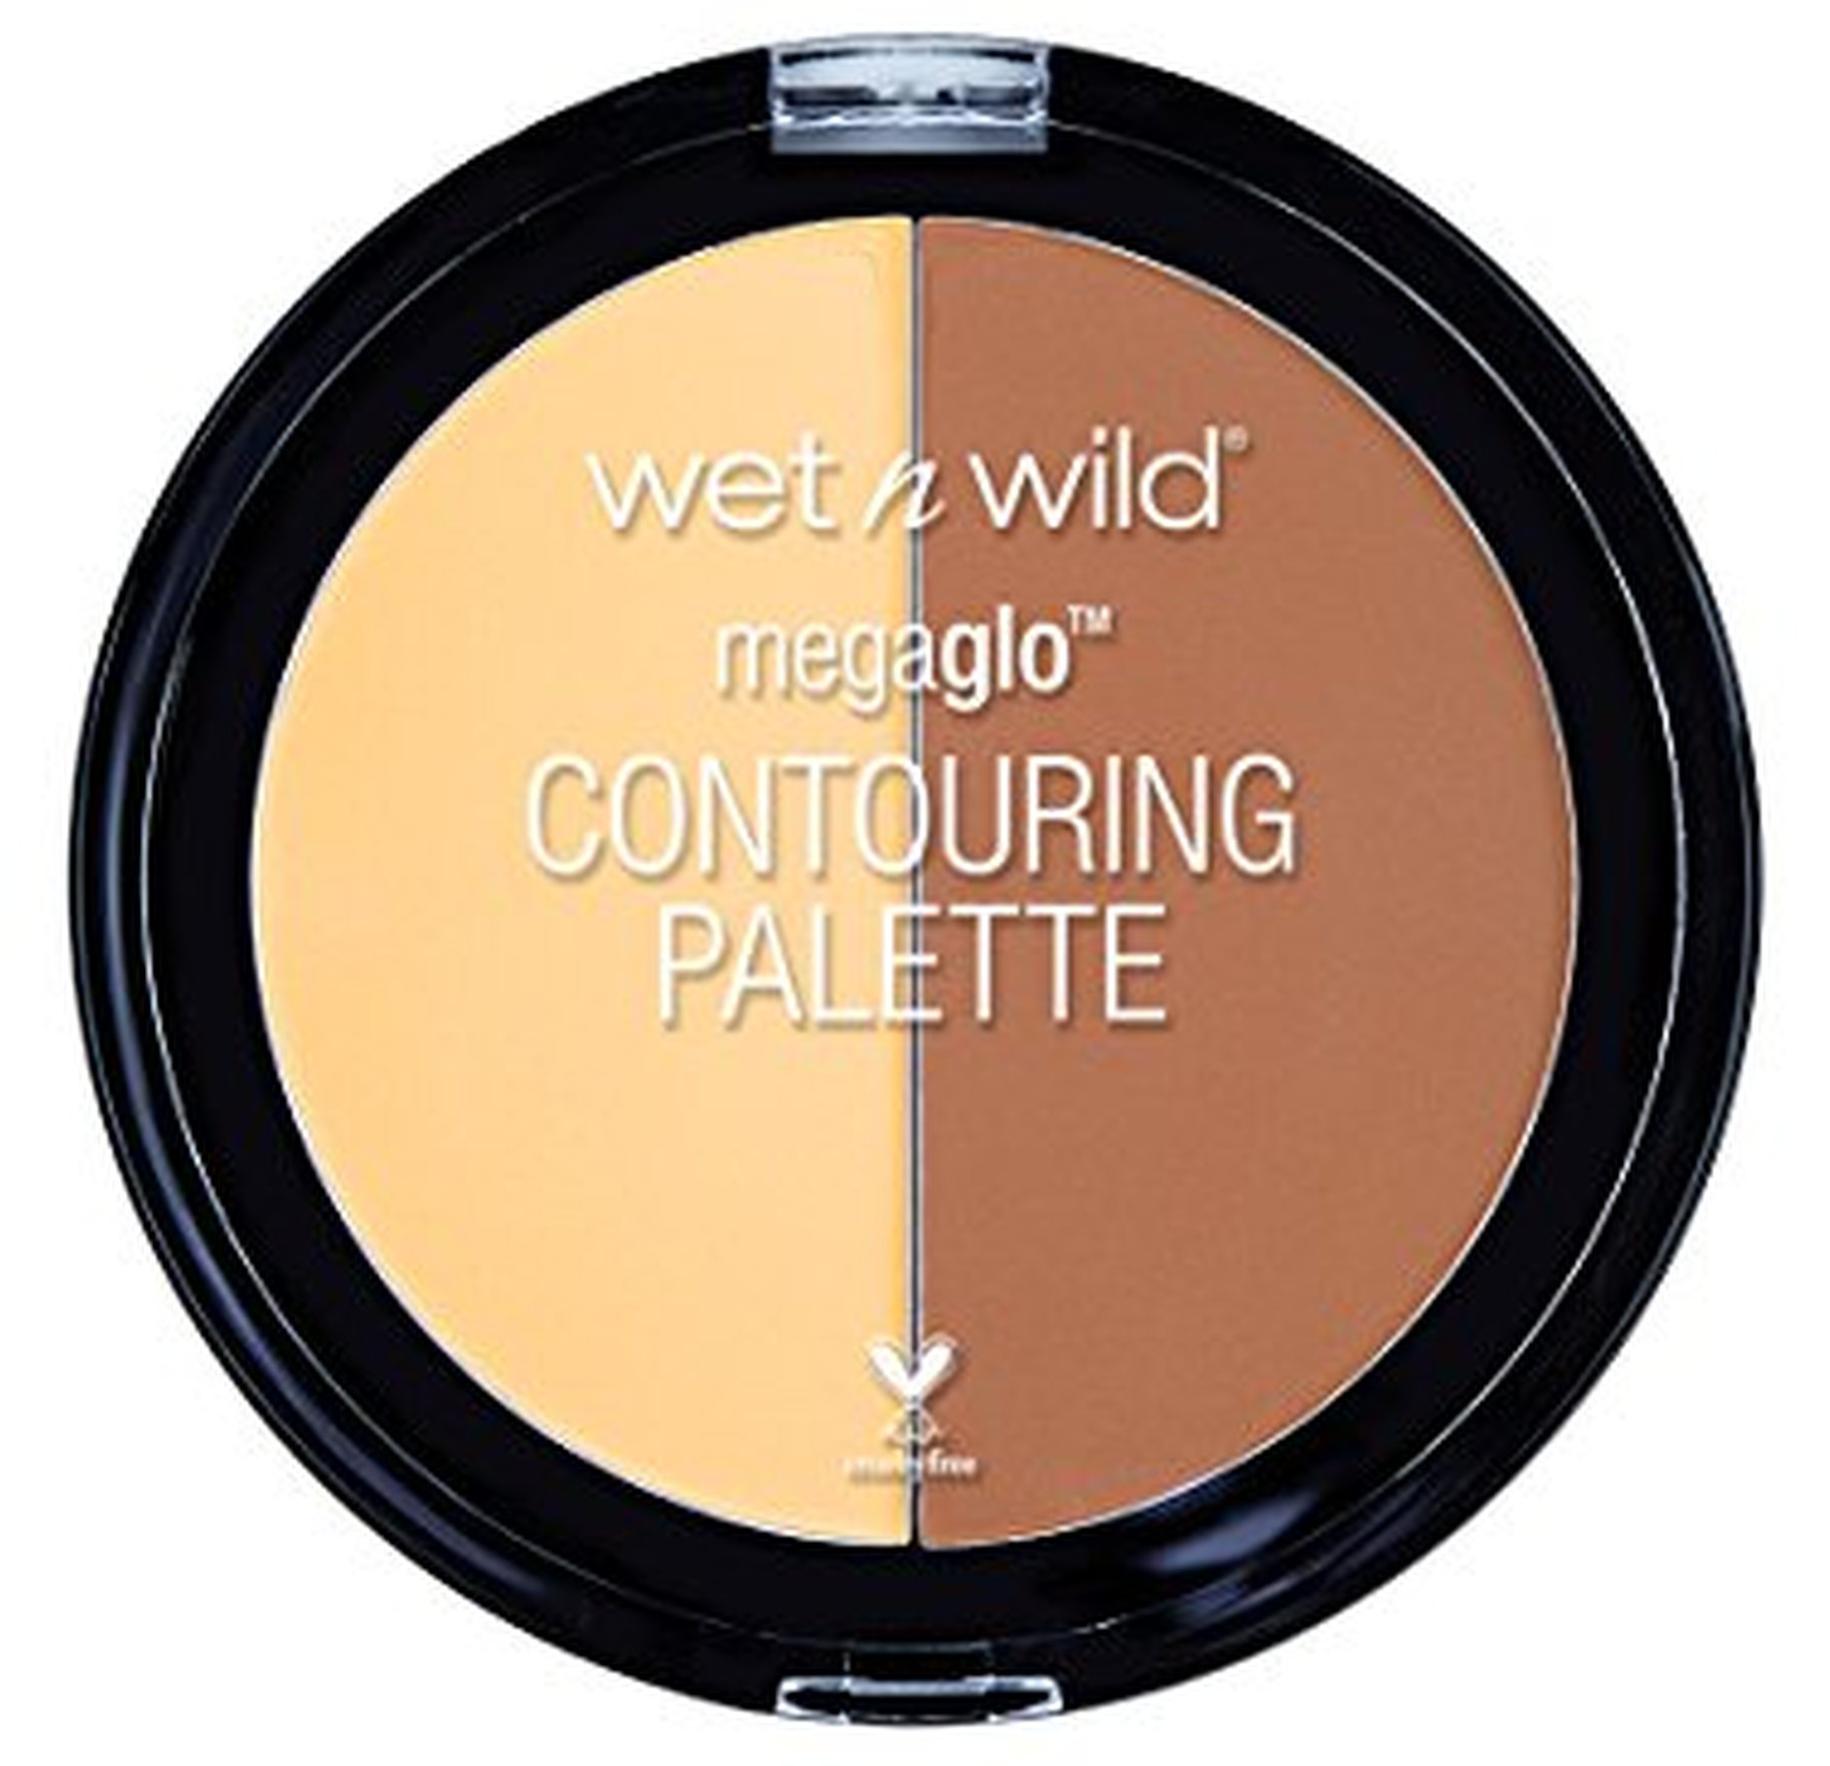 Wet N Wild Megaglo Contouring Palette Caramel Toffee 125 G 325 Mega Glo Dual Ended Contour Stick Light Medium